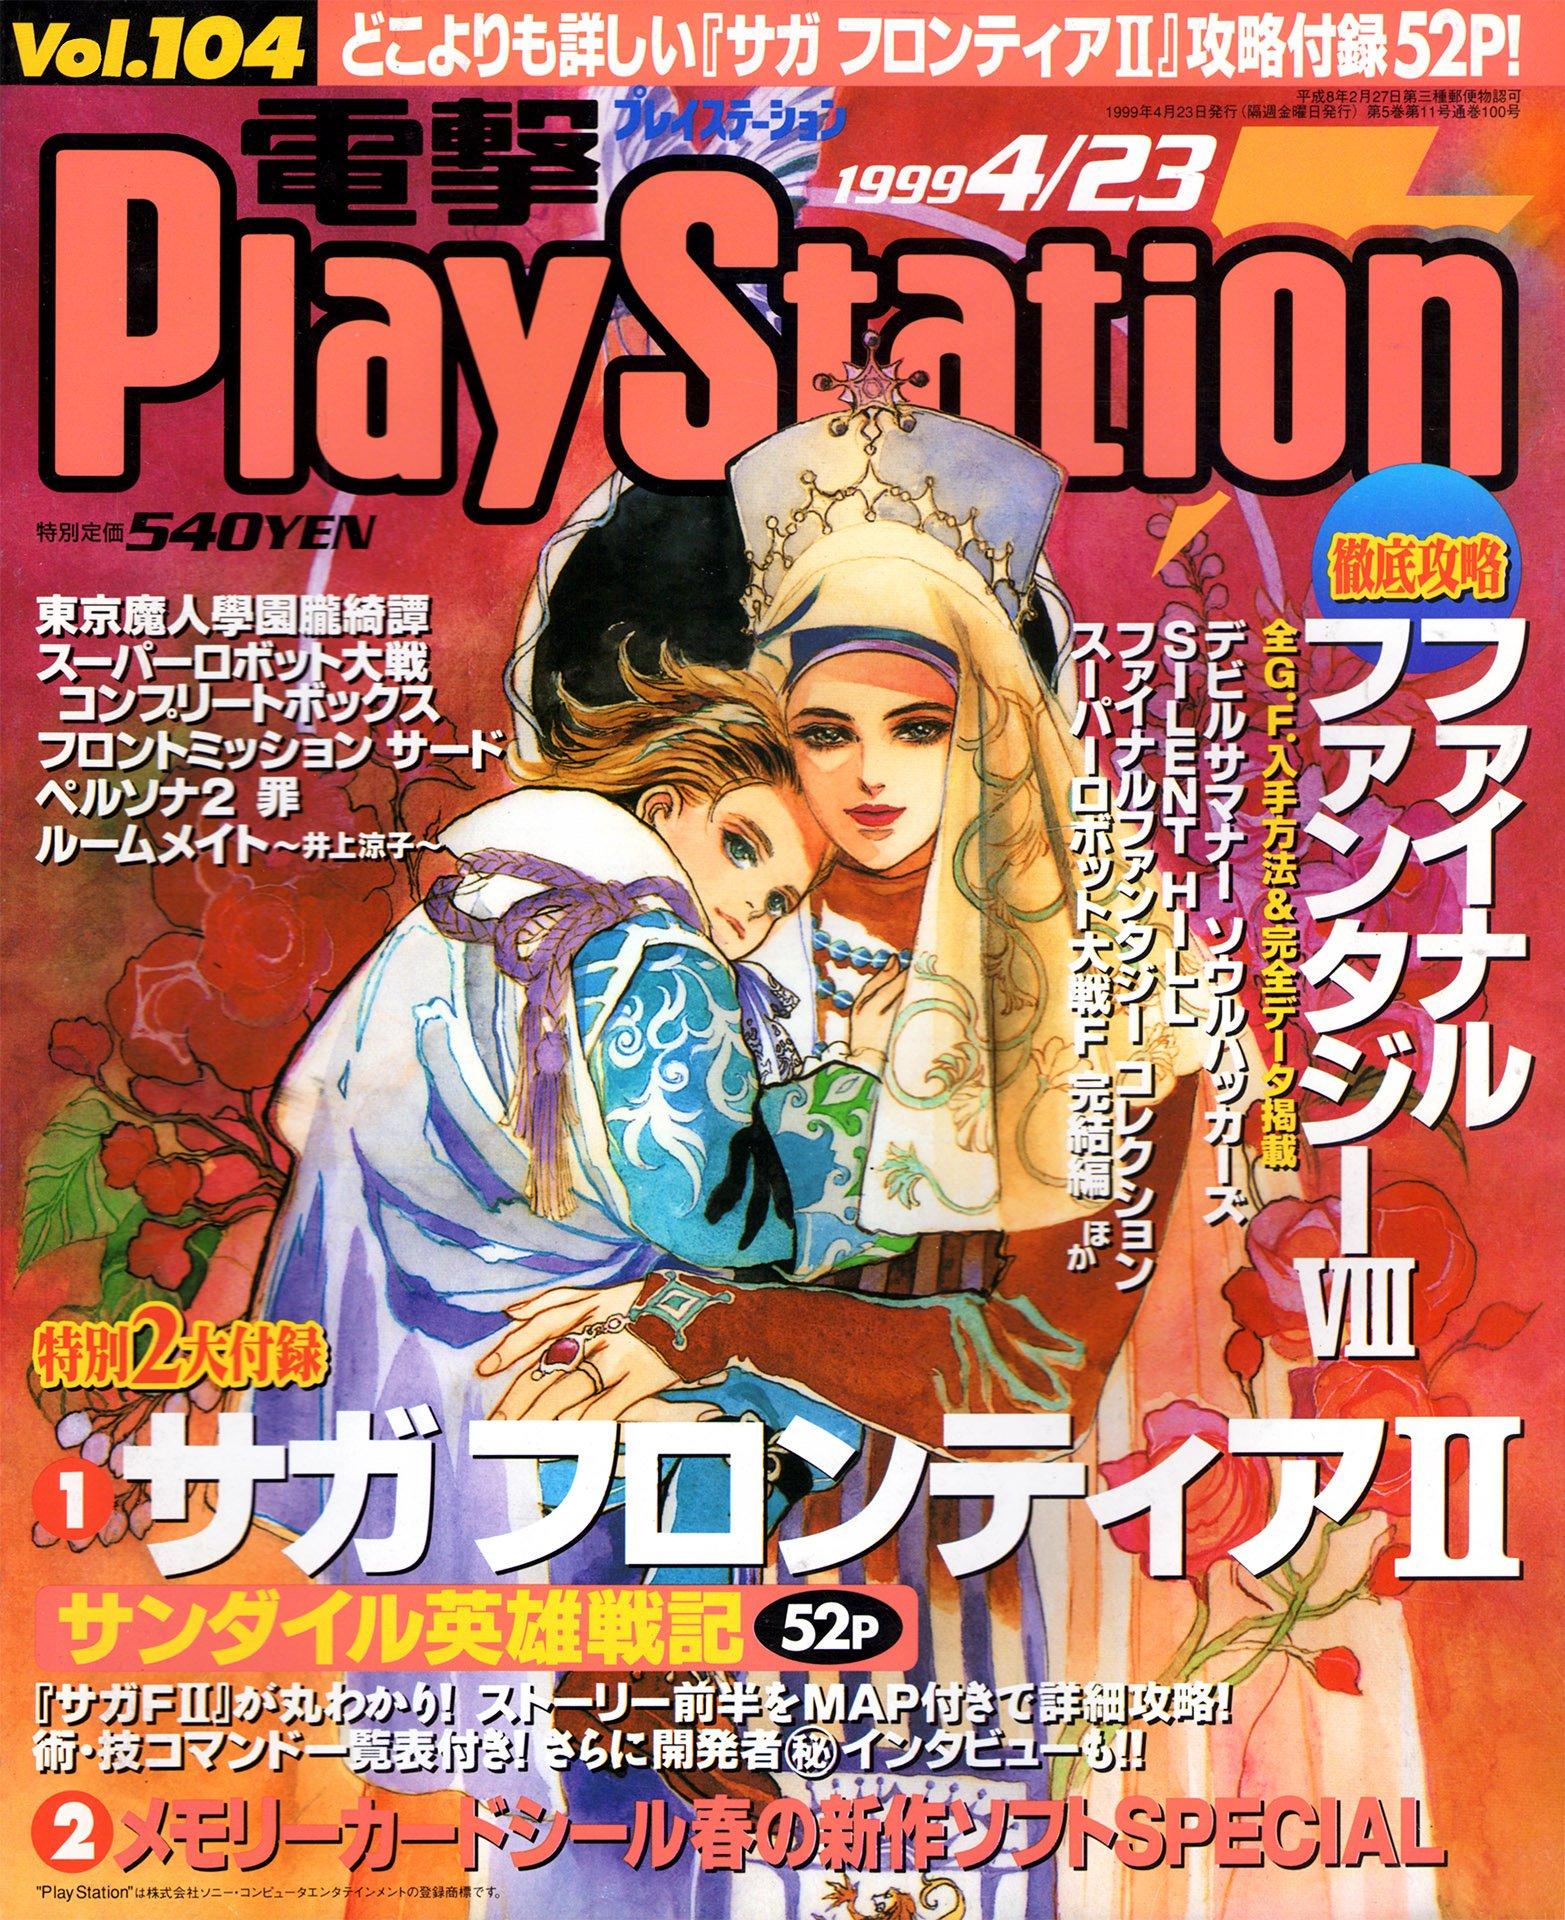 Dengeki PlayStation 104 (April 23, 1999)